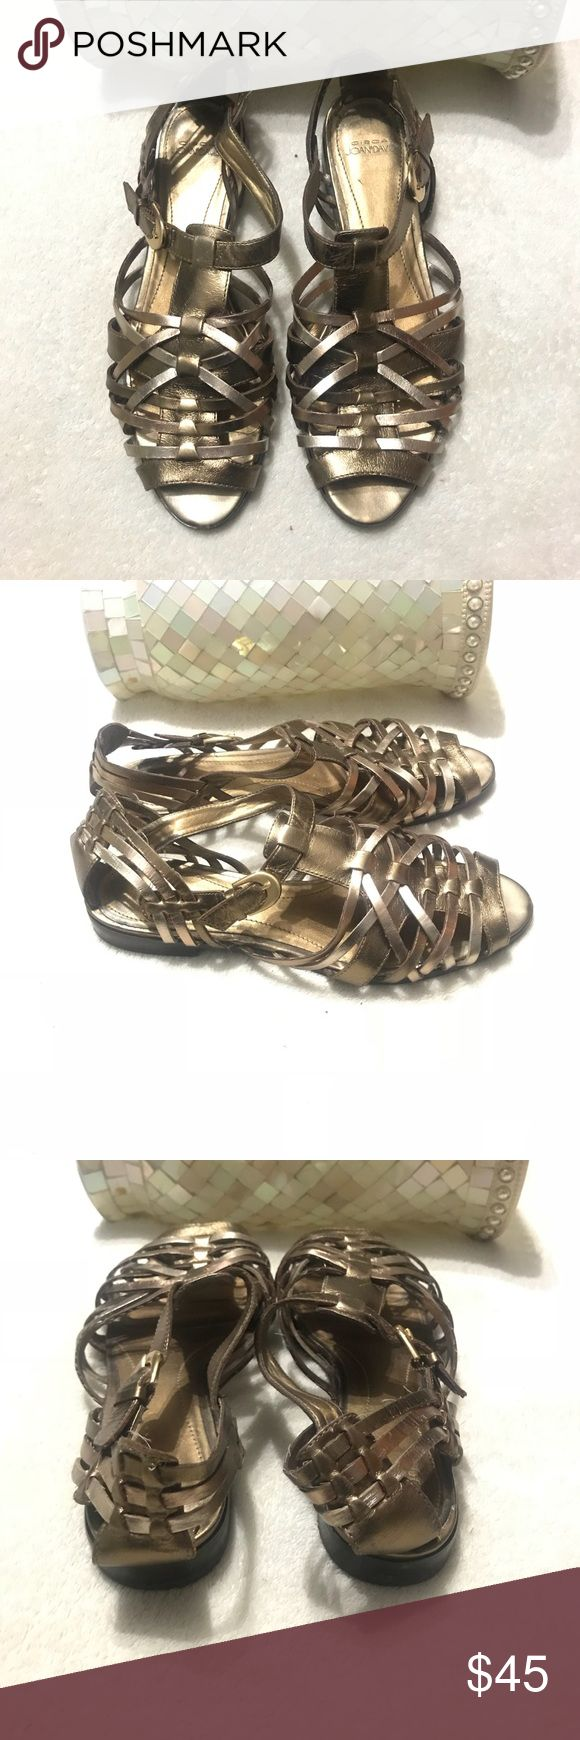 CIRCA Joan David Golden  Strappy Sandals Flats FEATURES   • Super Cute Strappy Sandals by CIRCA Joan & David  •Golden Color  • Sz 8.5  • Leather Upper  • Buckle Fastening Joan & David Shoes Sandals